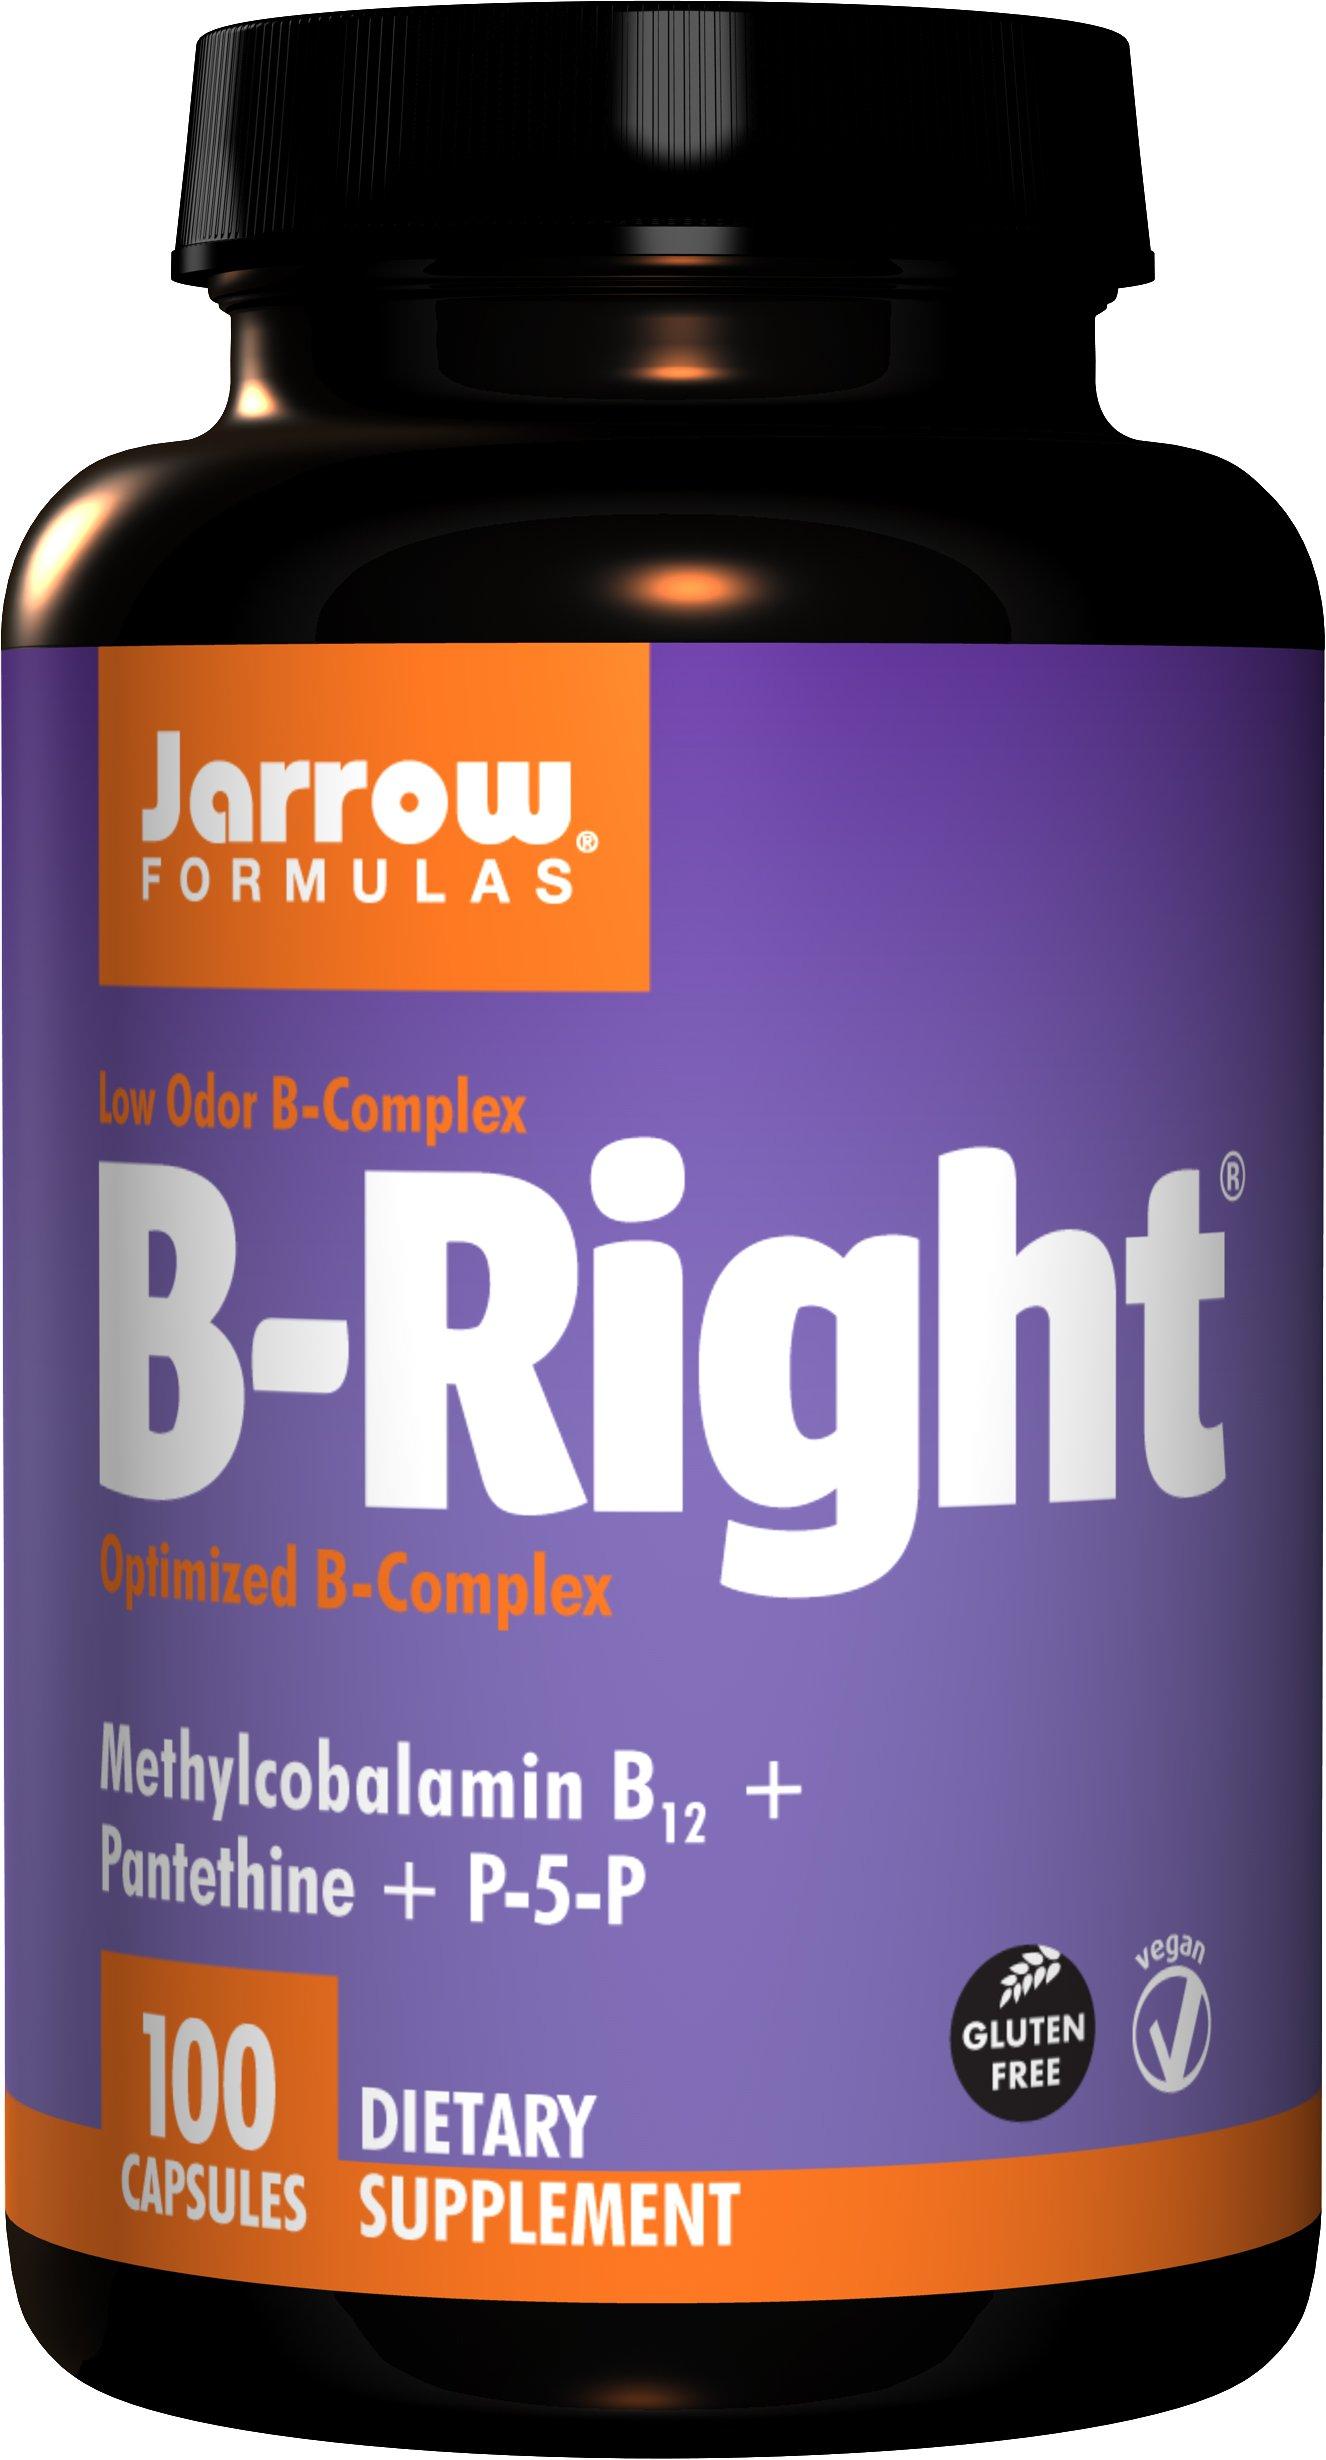 Jarrow Formulas - B-Right 100 Caps Pack Of 3